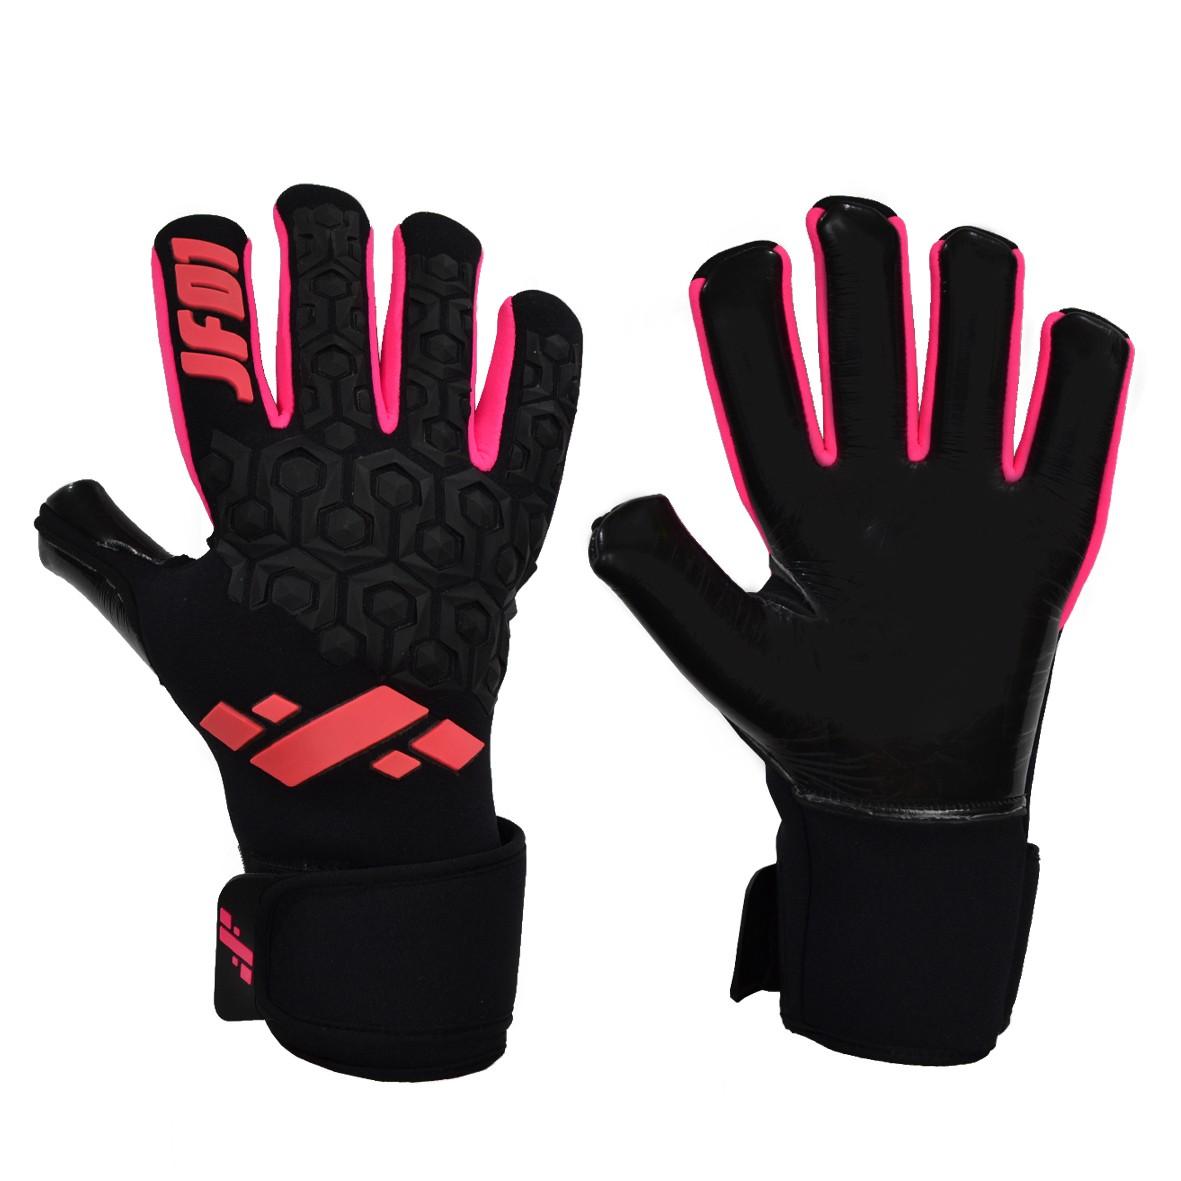 Luva de Goleiro Profissional JF01 Black Pink sem Finger